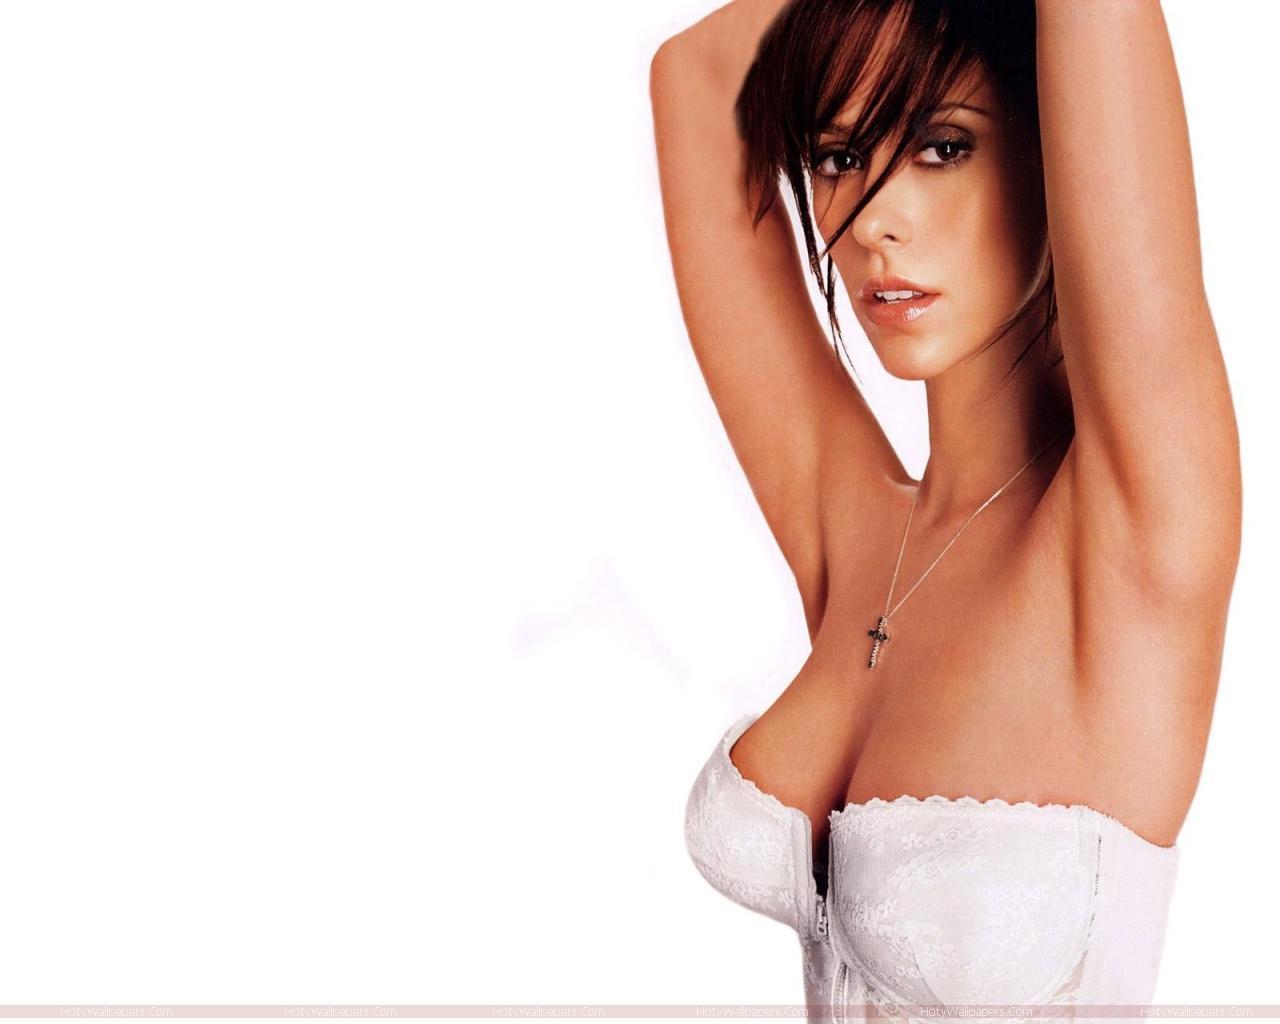 http://1.bp.blogspot.com/-6qFWk22hPF8/TmjcP8rbV3I/AAAAAAAAKtk/5UTT_o1uApo/s1600/Jennifer_Love_Hewitt_Hot_HD_Wallpaper.jpg